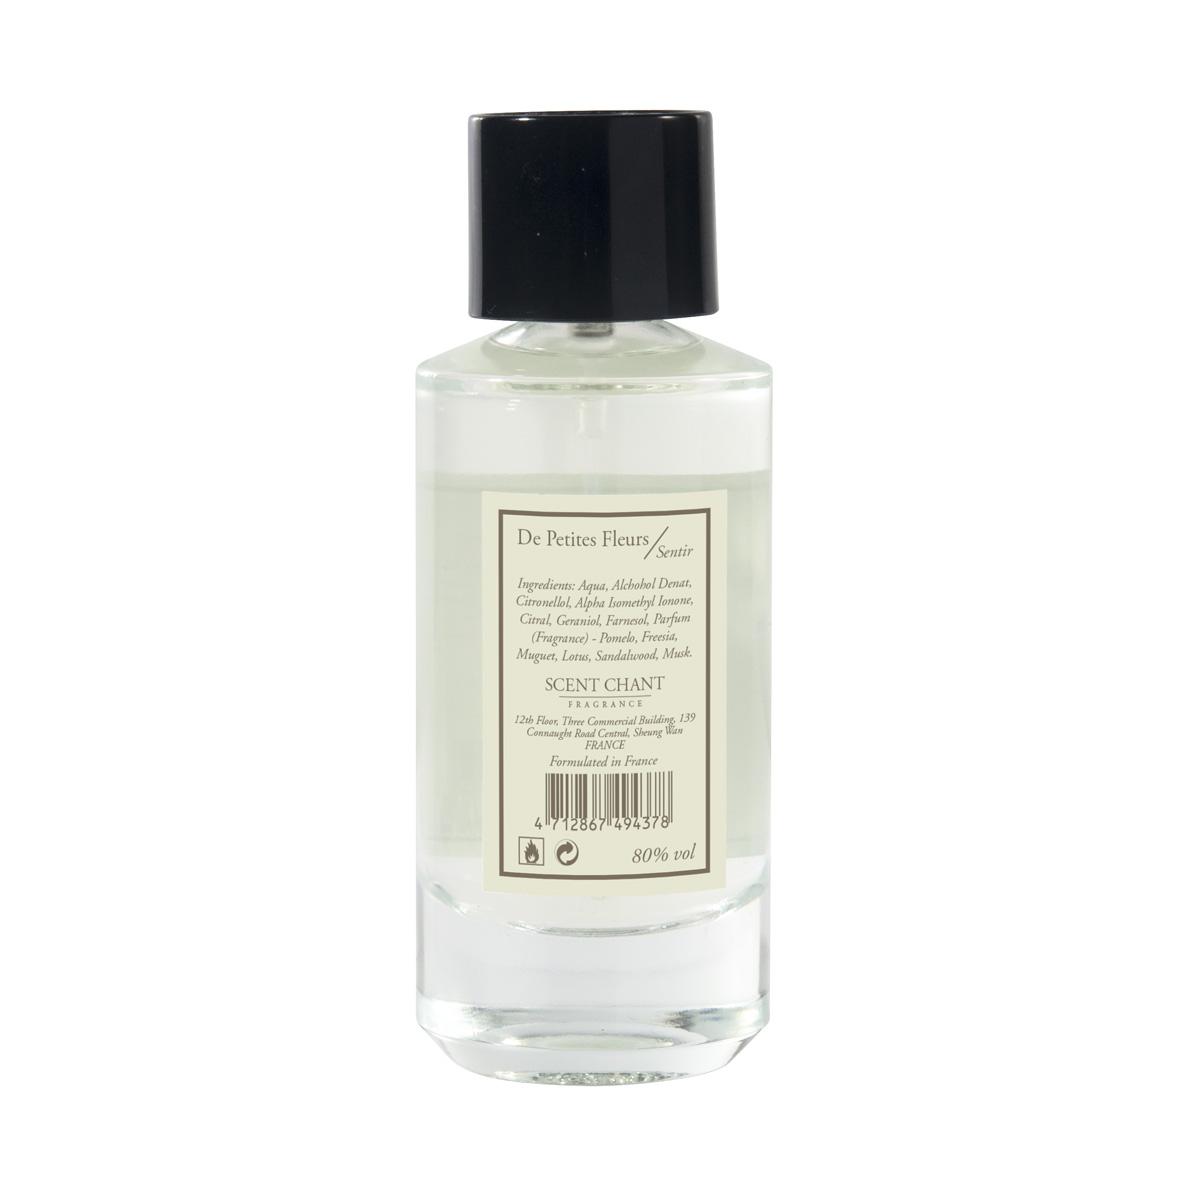 scentchant宣香一朵小花小众香水好用吗